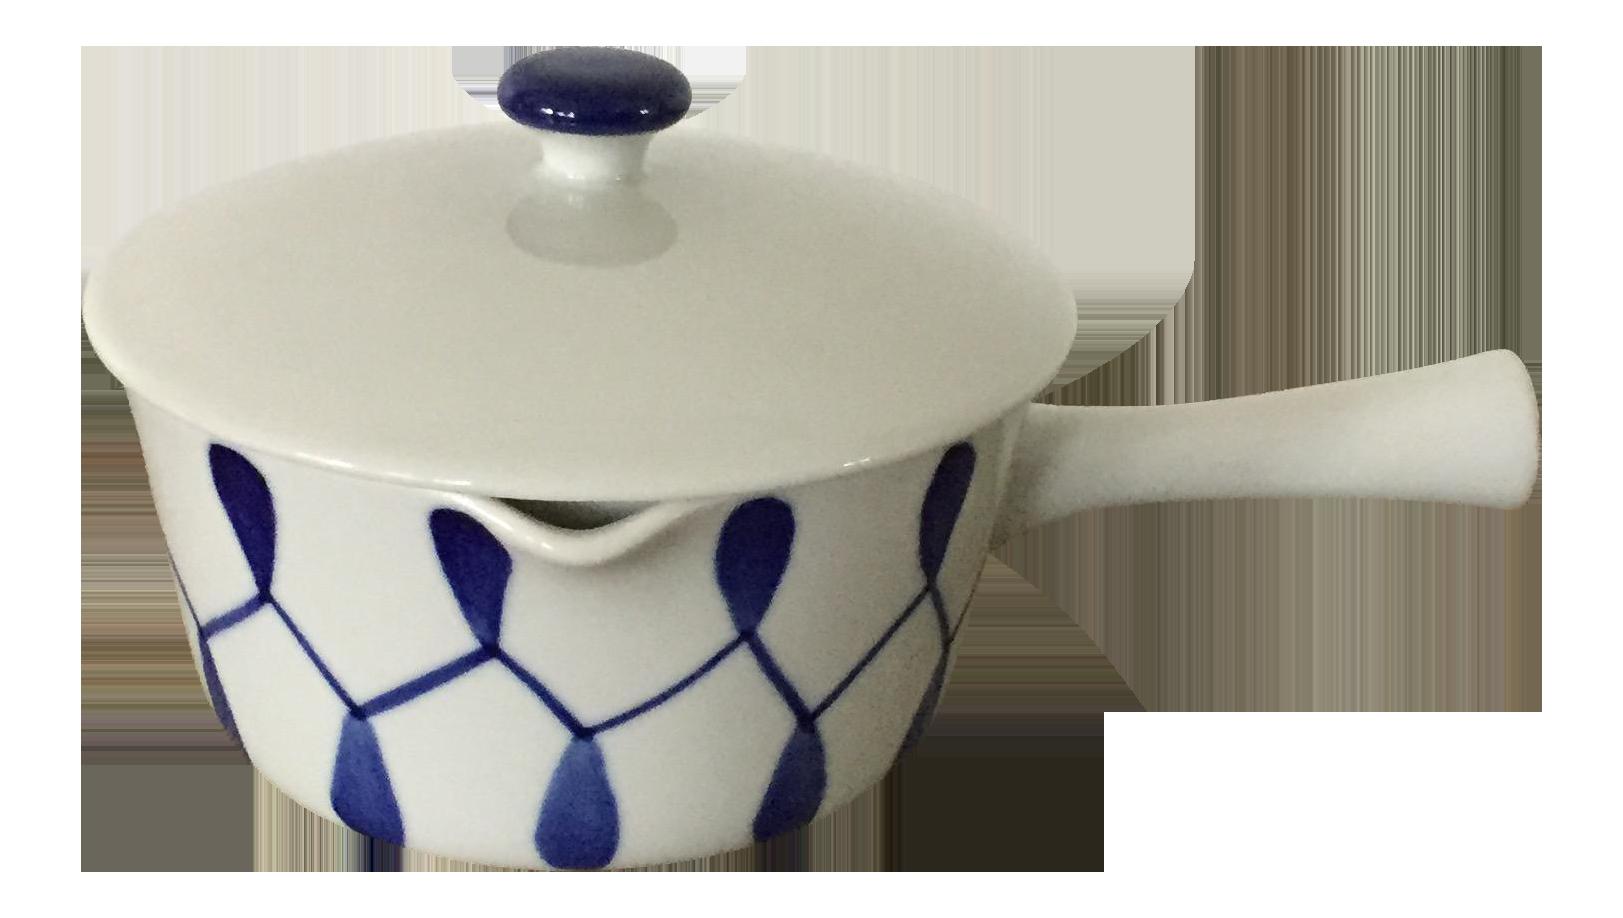 Vintage Danmark Lyngby Porcelain Danish Modern Pot  sc 1 st  Chairish & Vintage Danmark Lyngby Porcelain Danish Modern Pot | Chairish